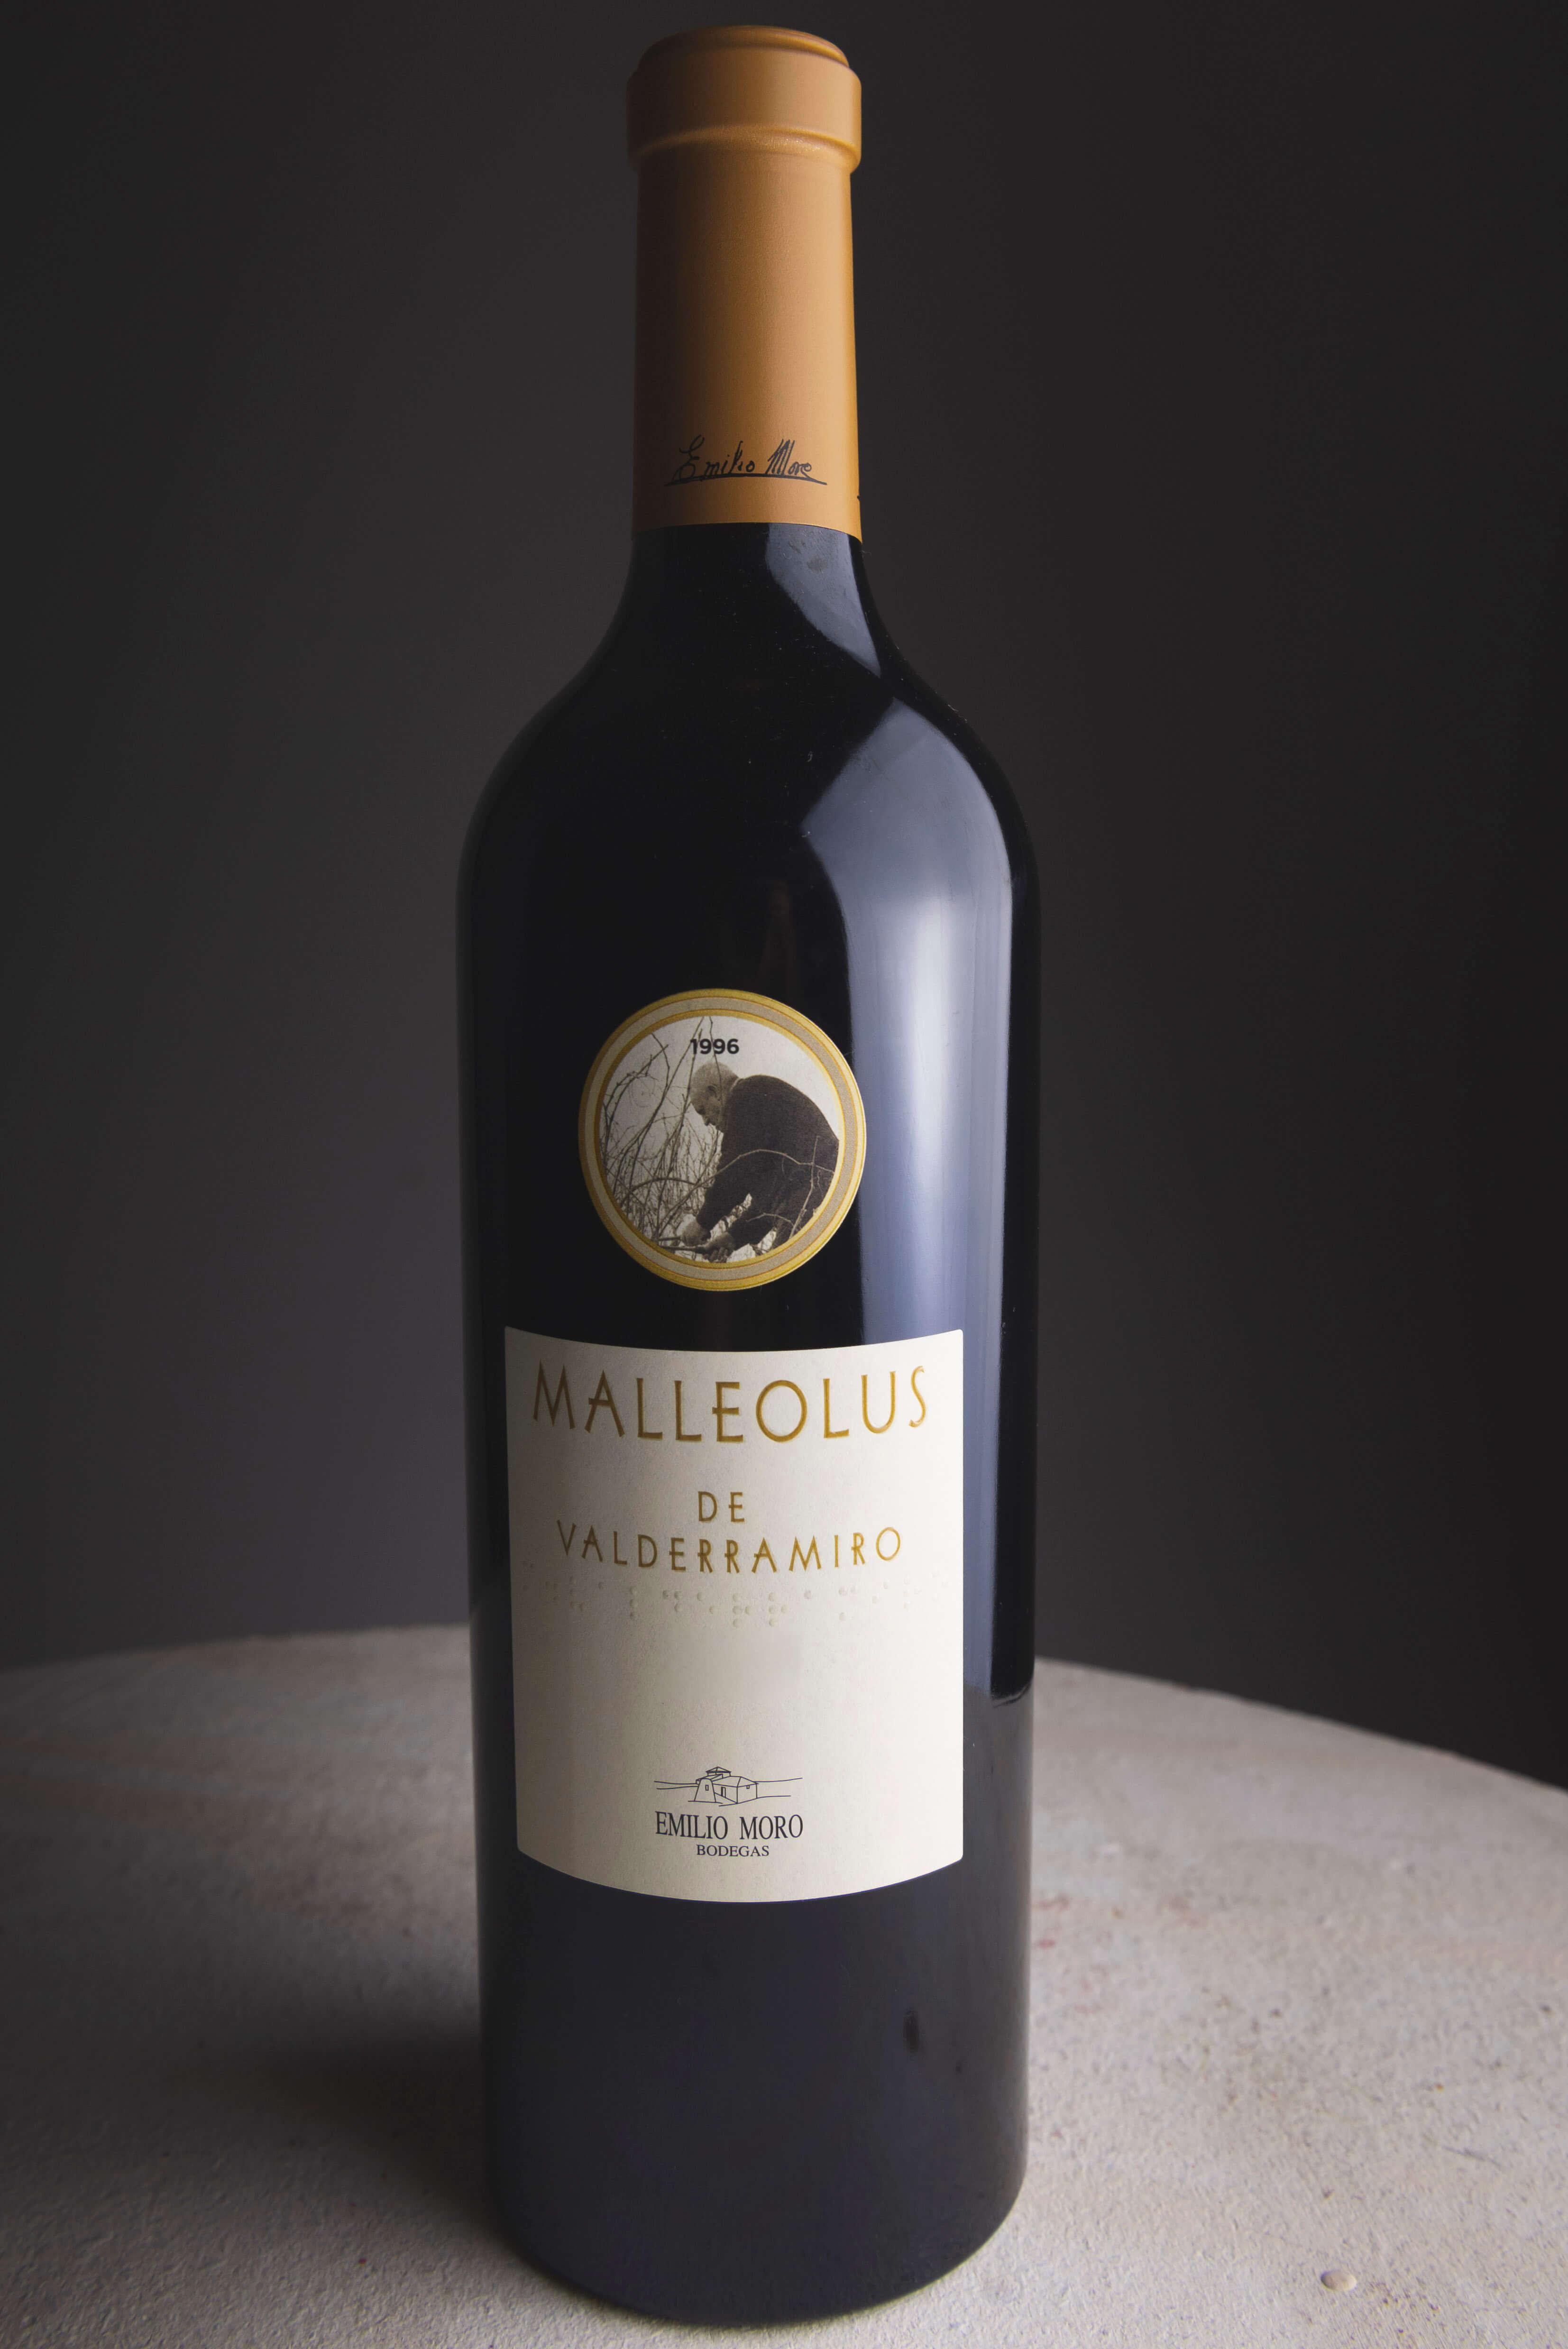 Comprar Malleolus de Valderramiro 2